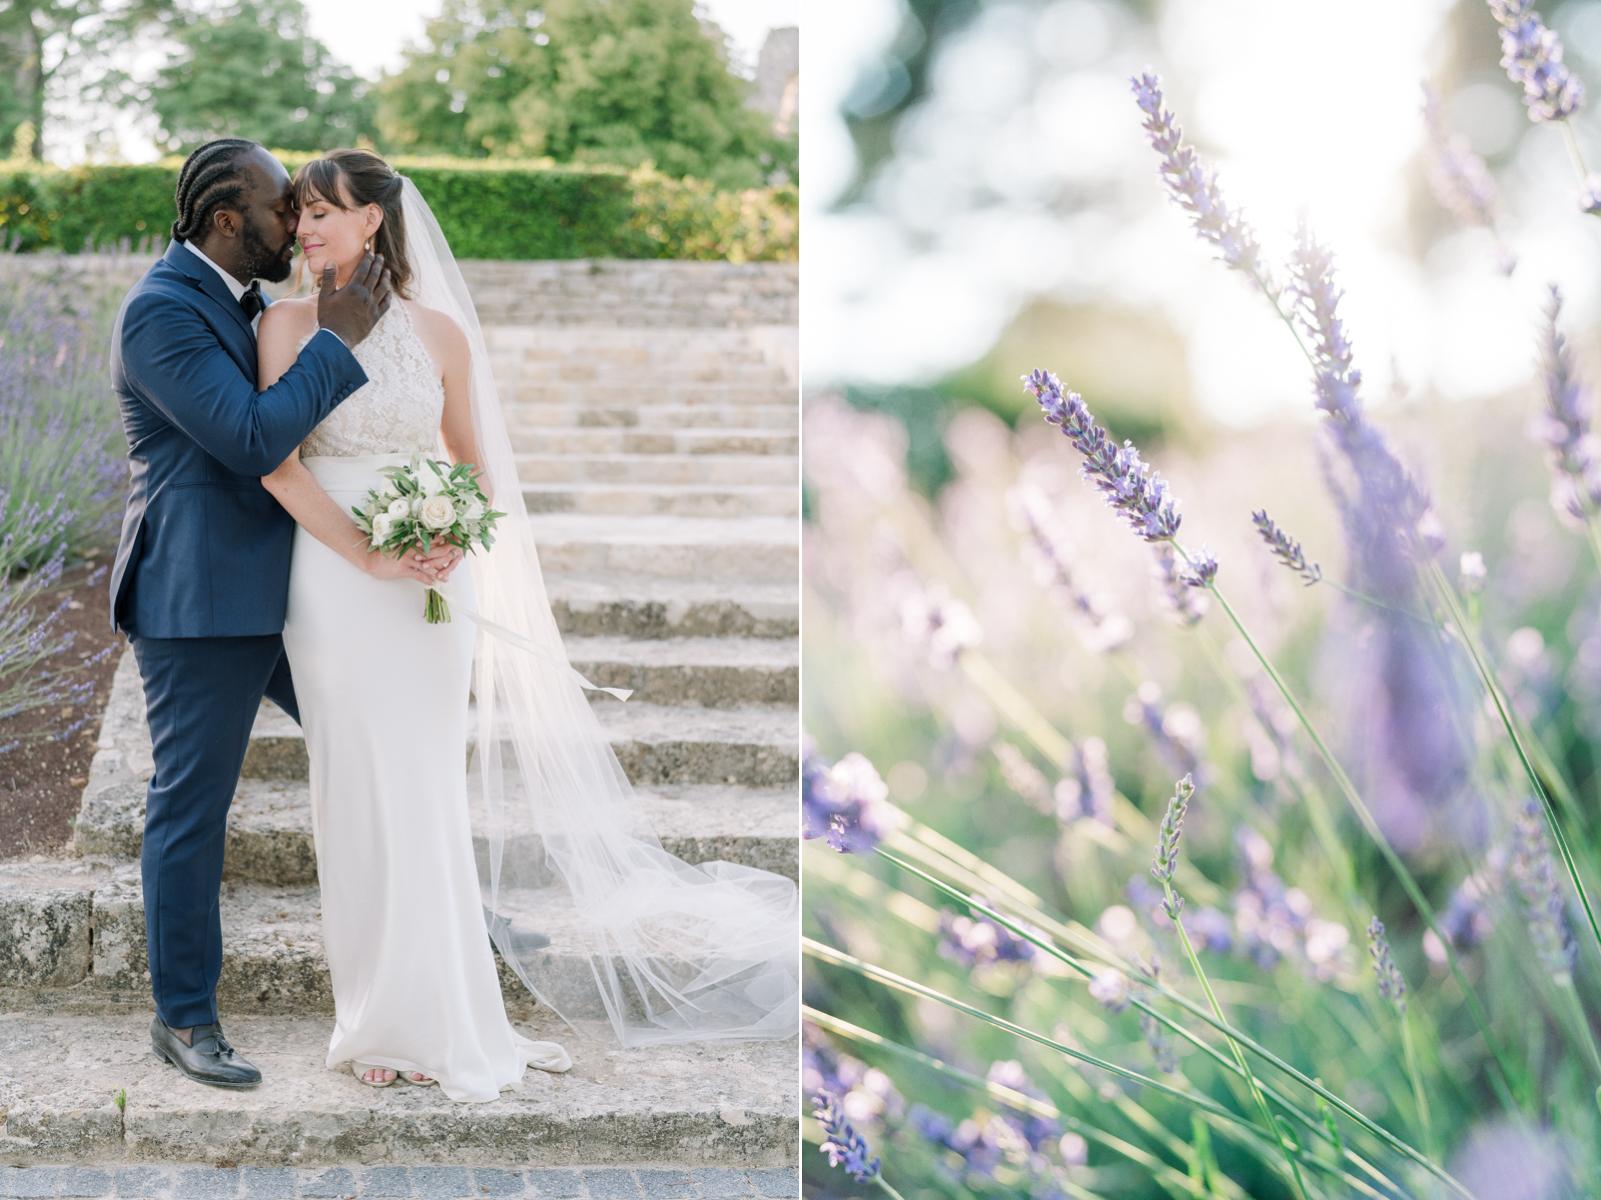 Boheme-Moon-Photography-Wedding-in-Provence-France_024.jpg